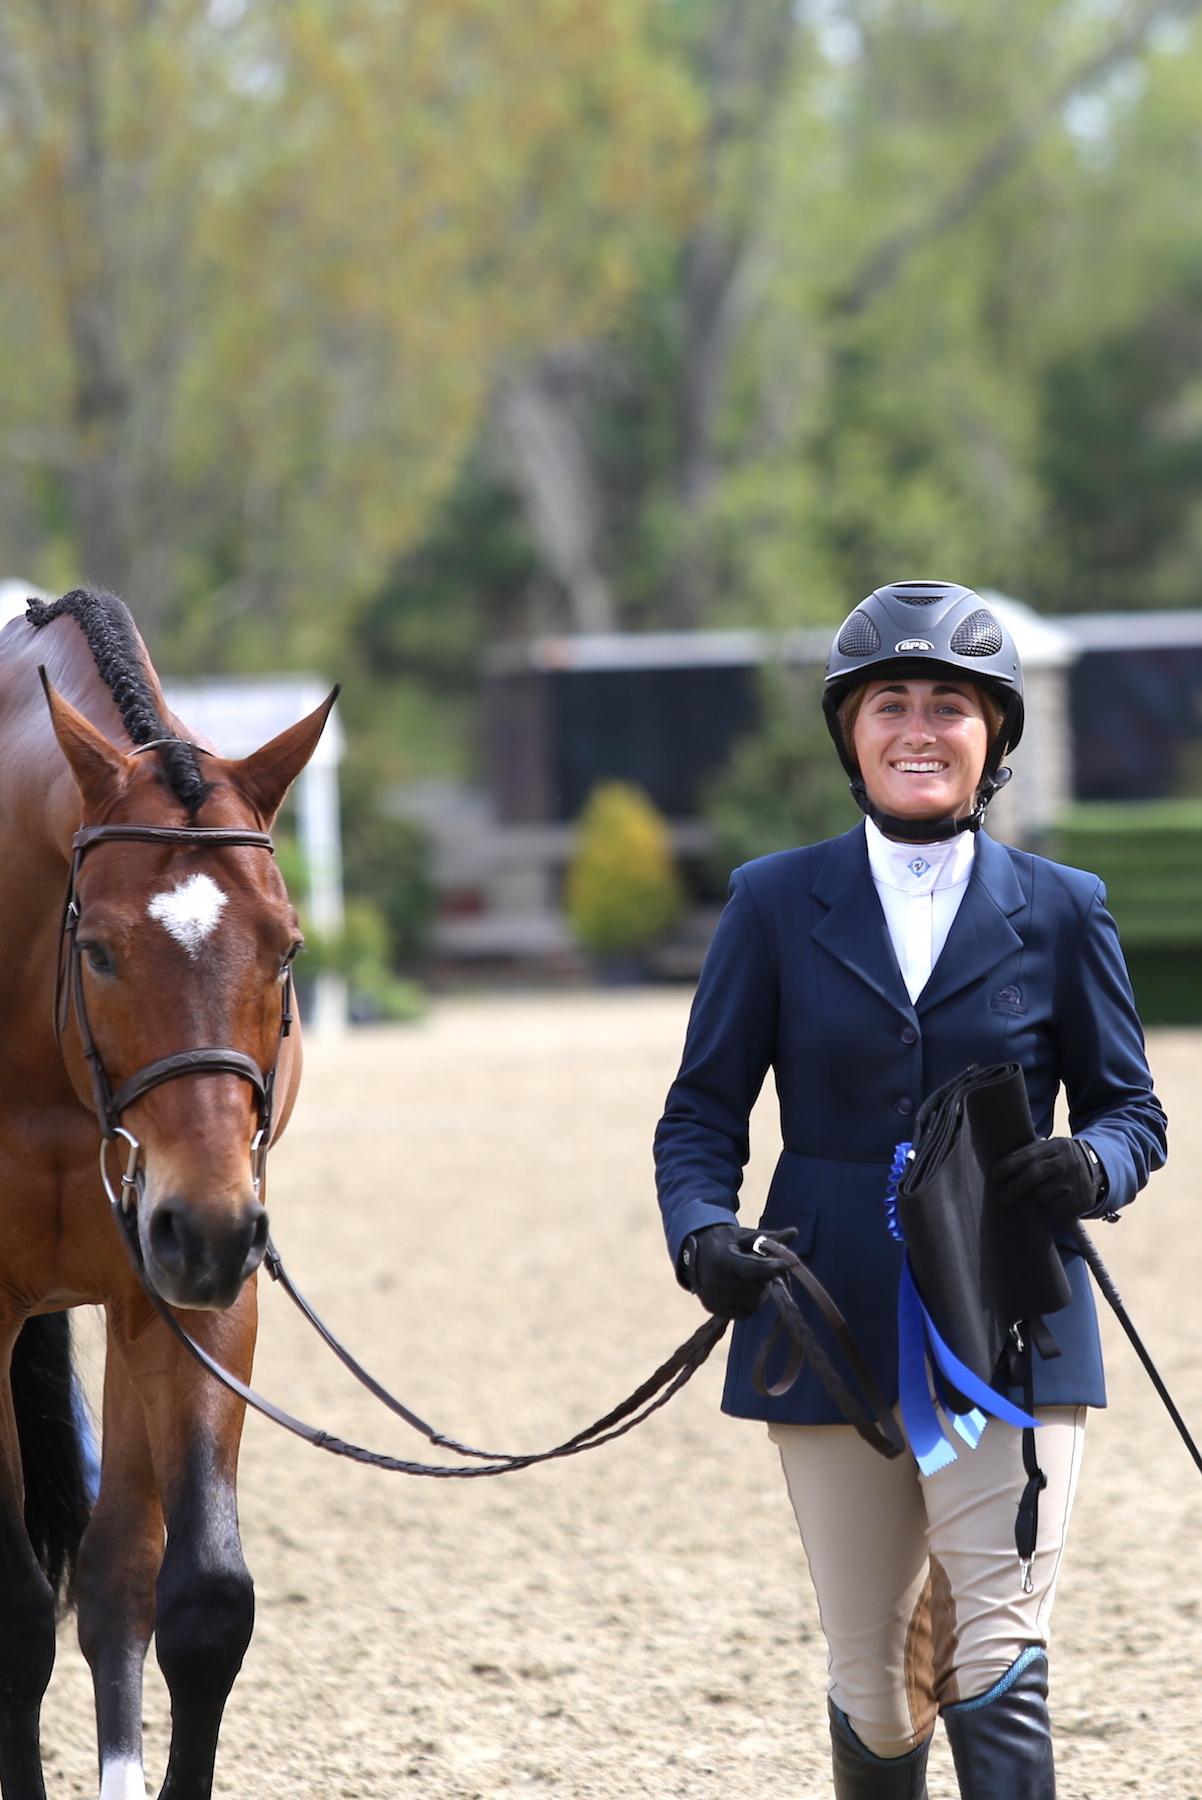 Competition kicked off at The Old Salem Farm Spring Shows this week.Photo byLindsay Brock for Jennifer Wood Media, Inc.